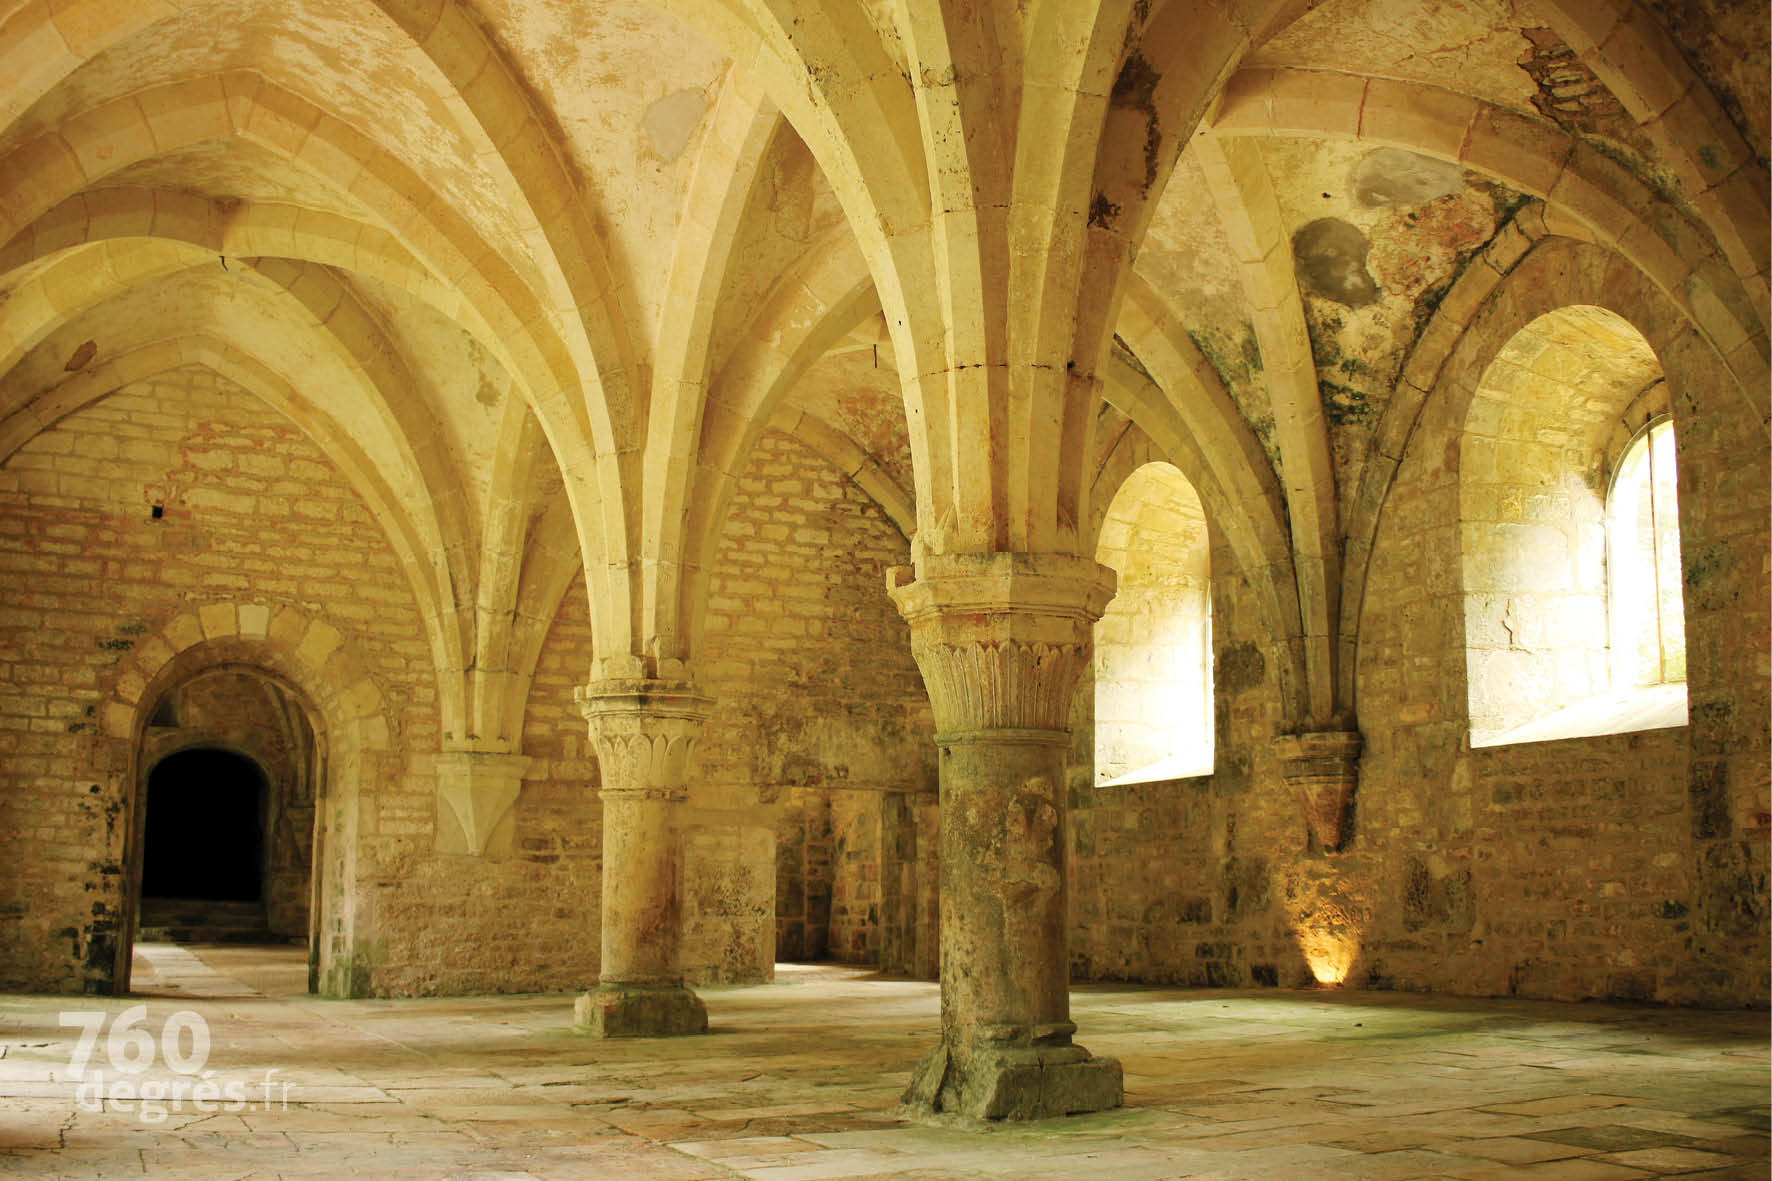 760degres-abbaye-fontenay-16